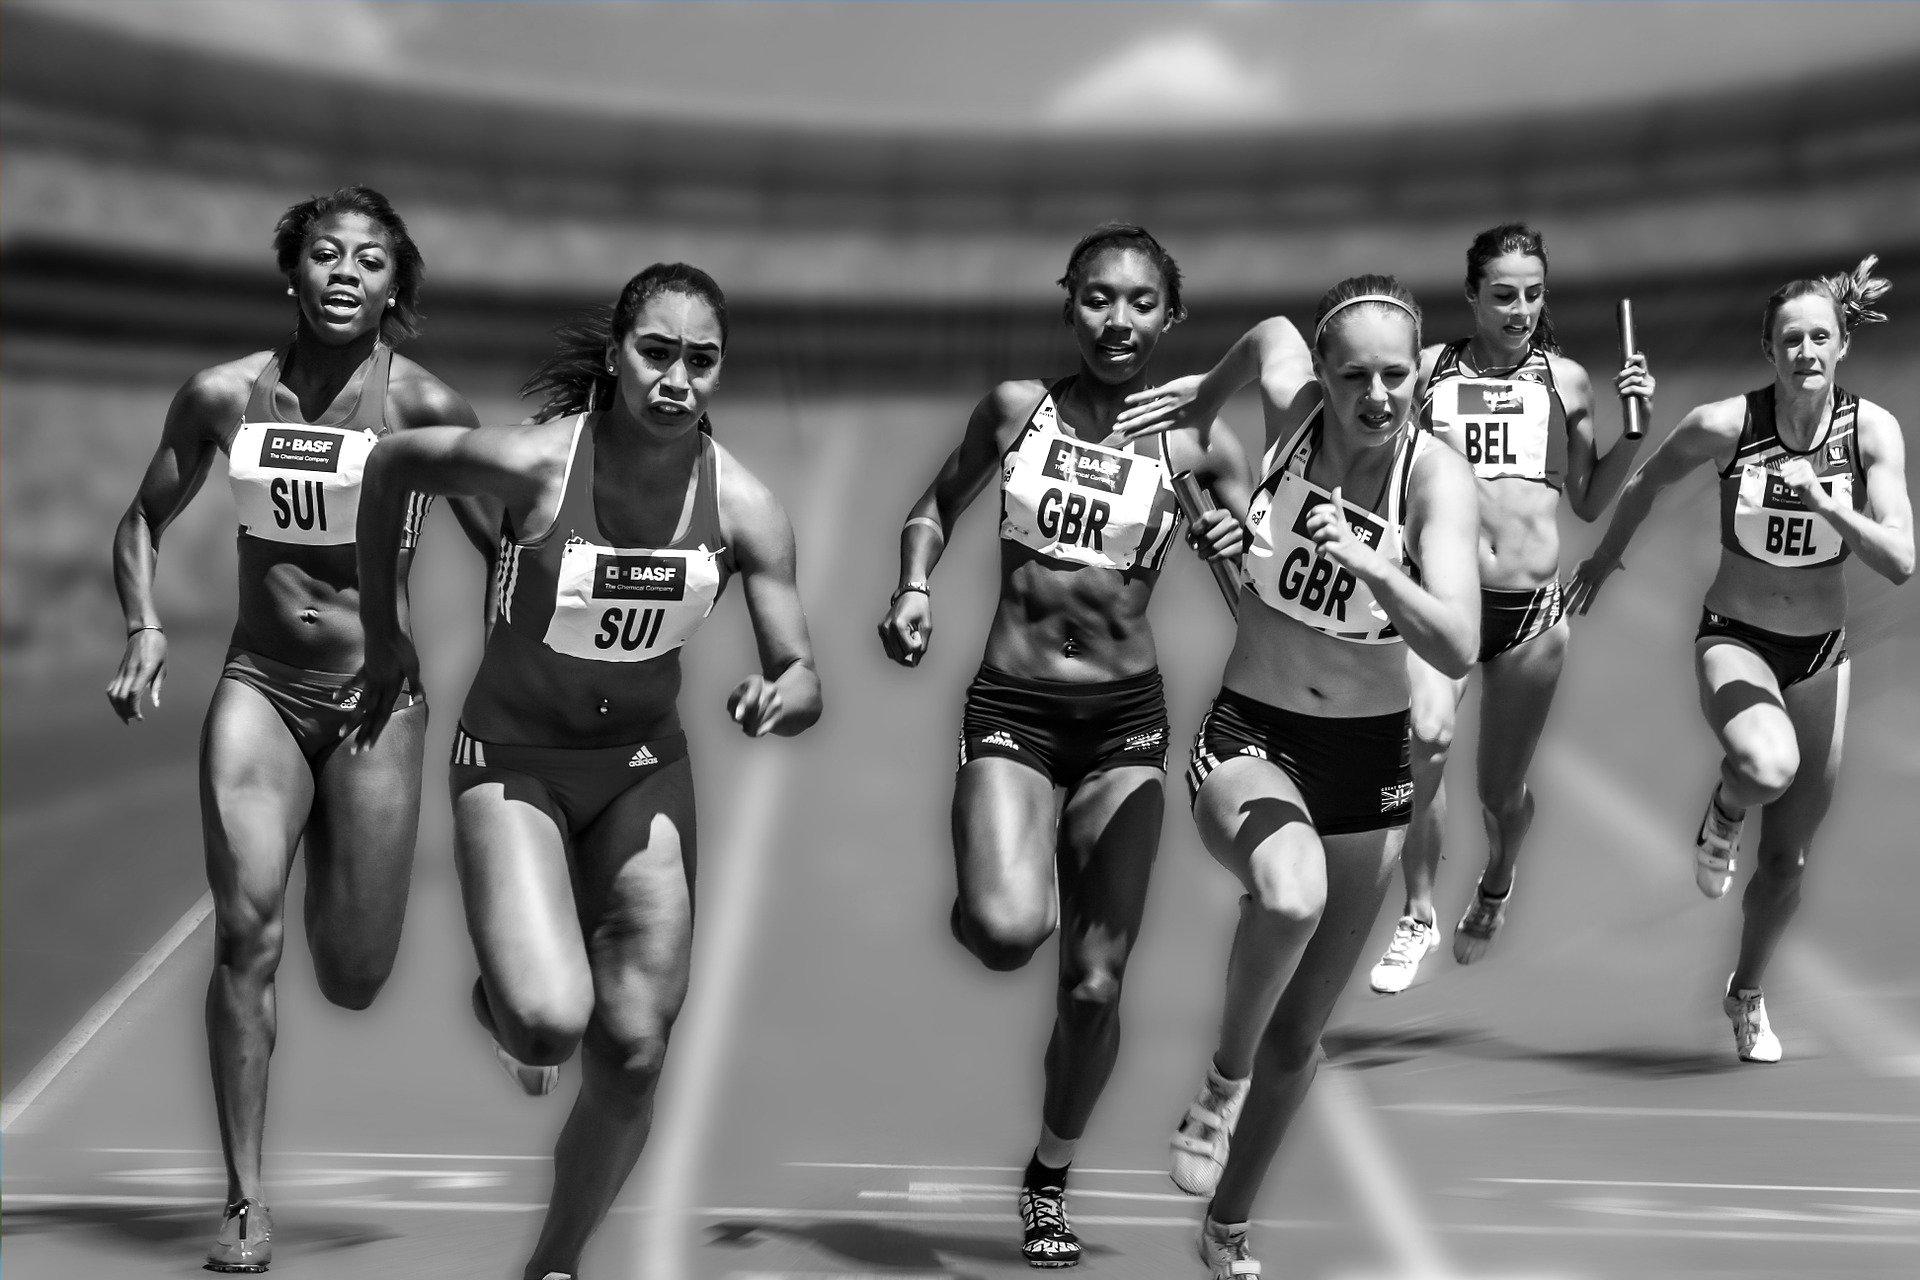 women running on a marathon